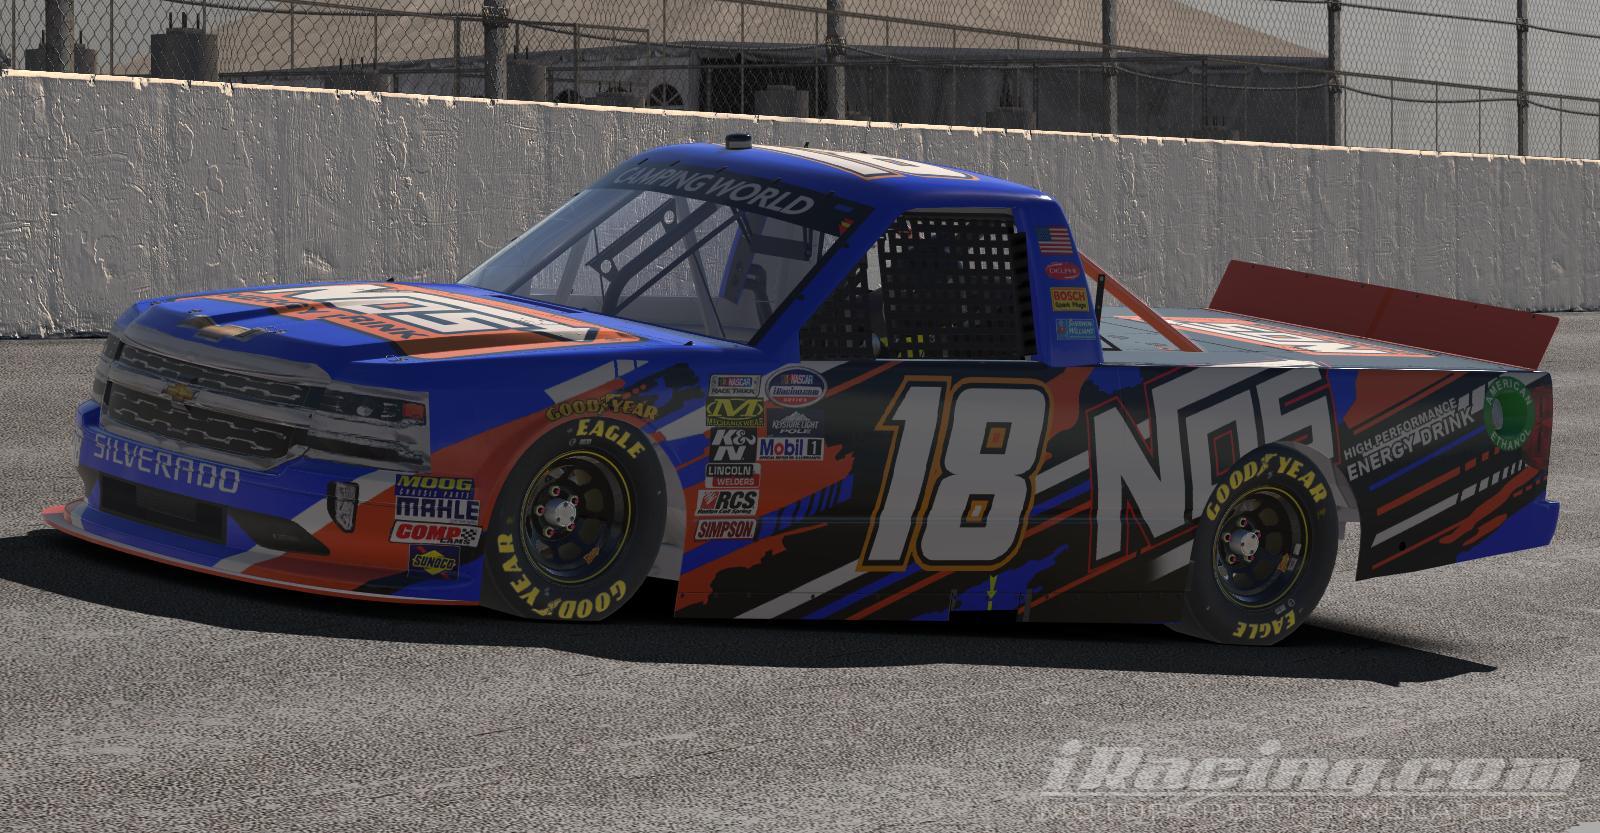 Preview of NOS Energy Chevrolet Silverado by Tanner Tallarico